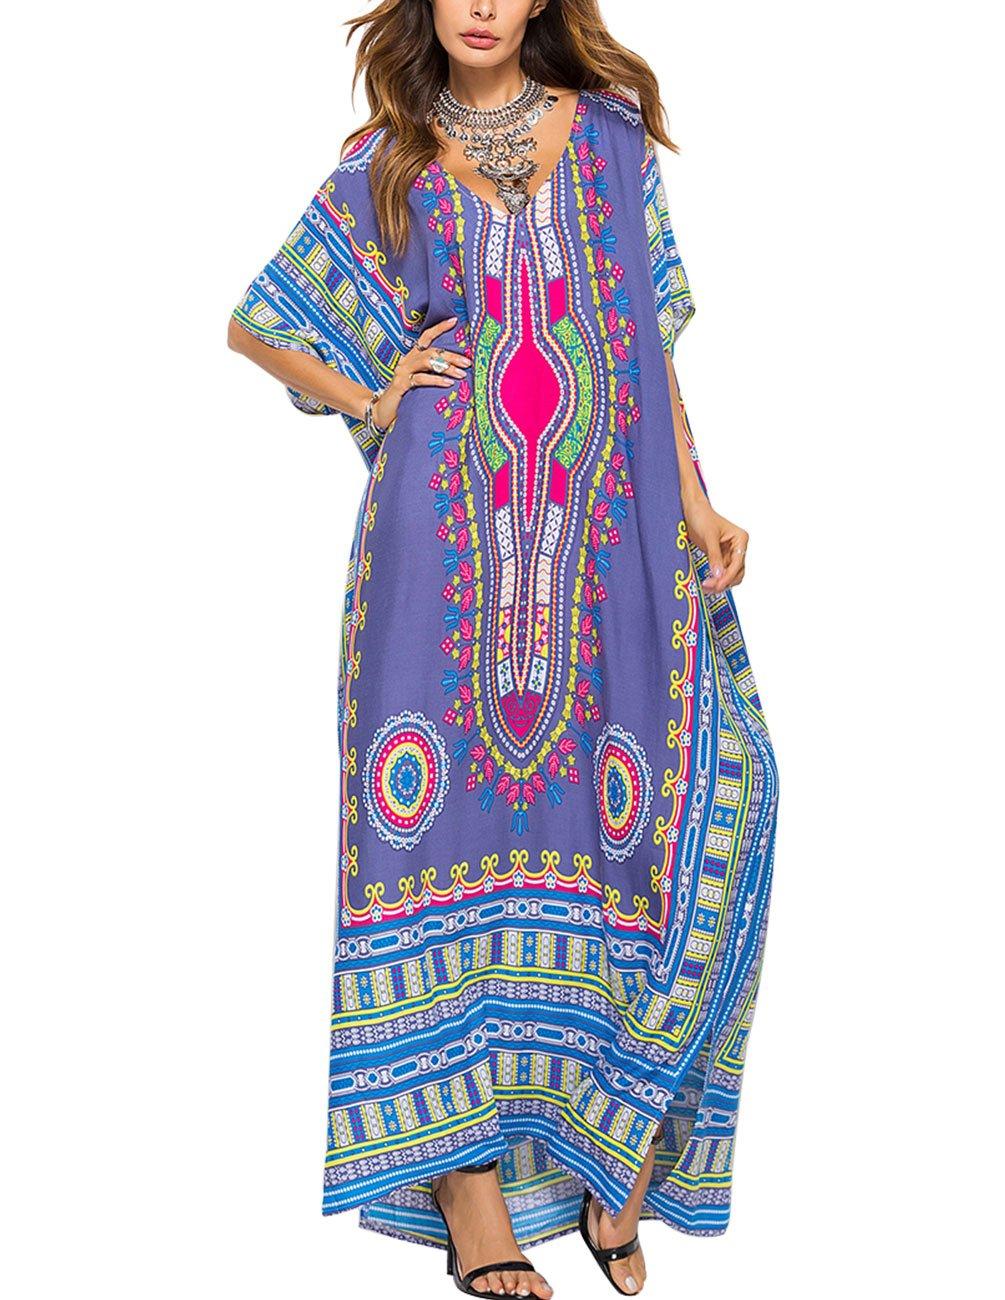 Buauty Casual Floral Maxi Dress Caftan Coverup